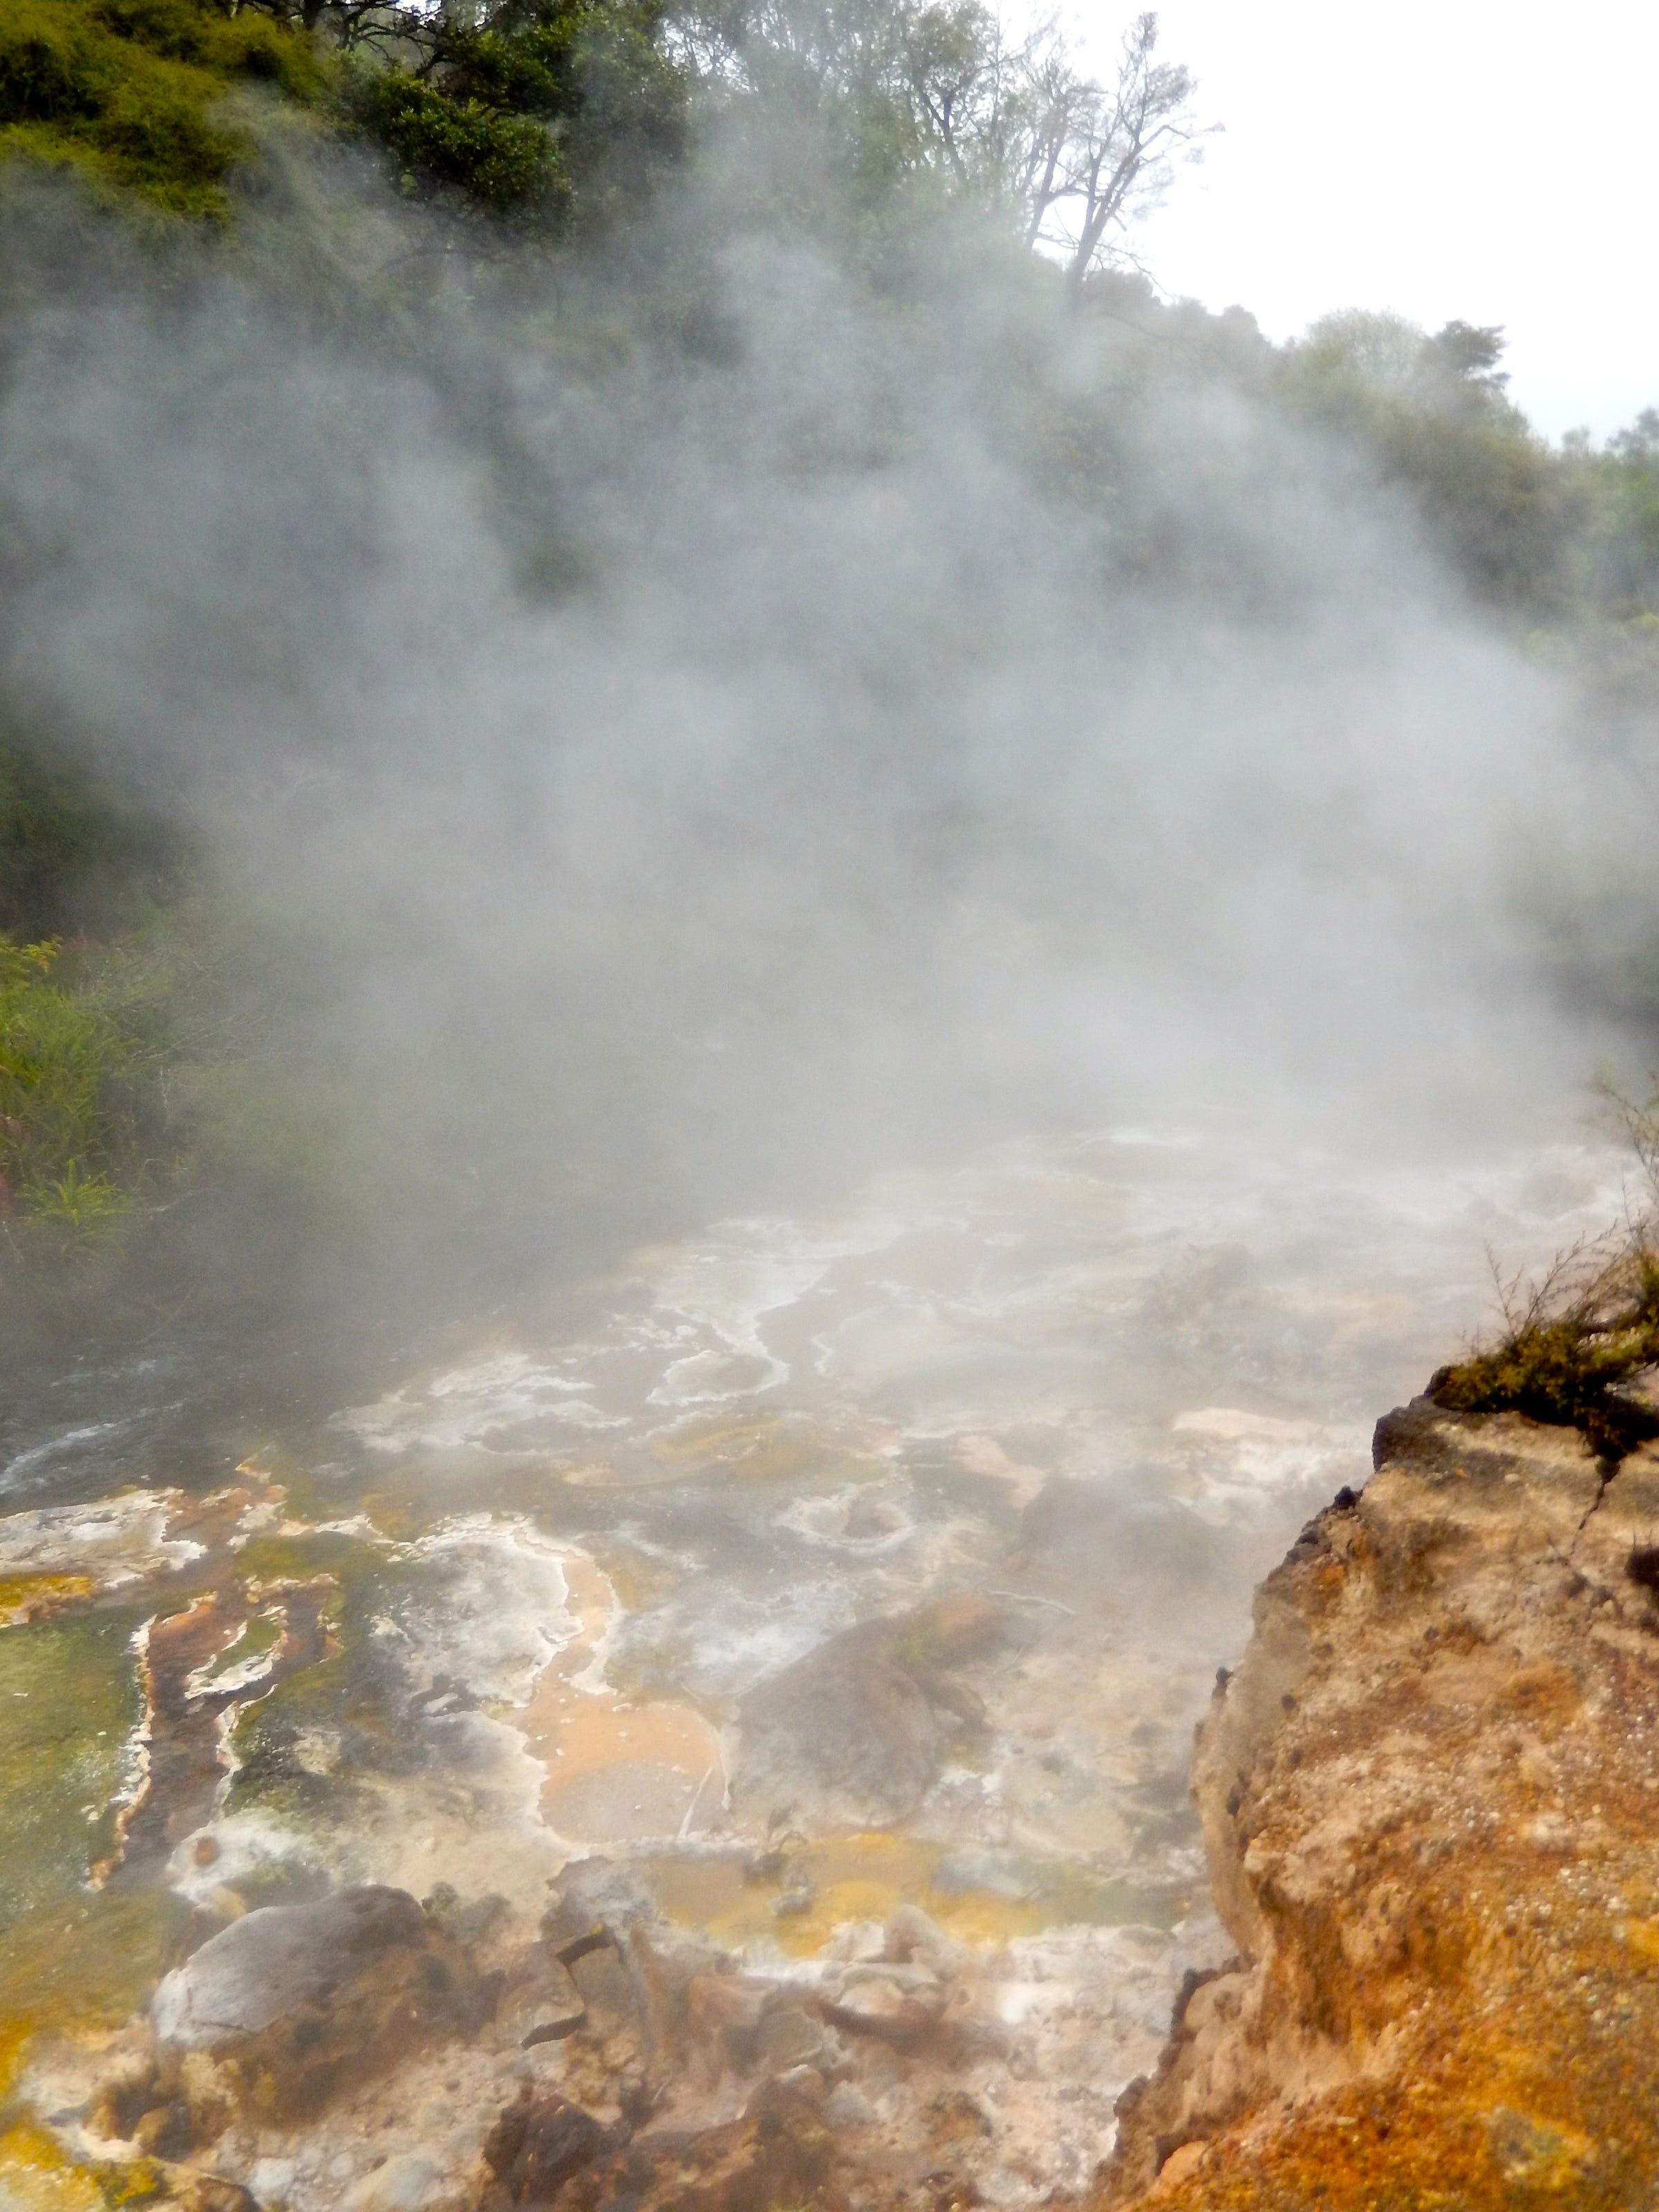 635789032893278651-Waimangu-Geothermal-System.jpg